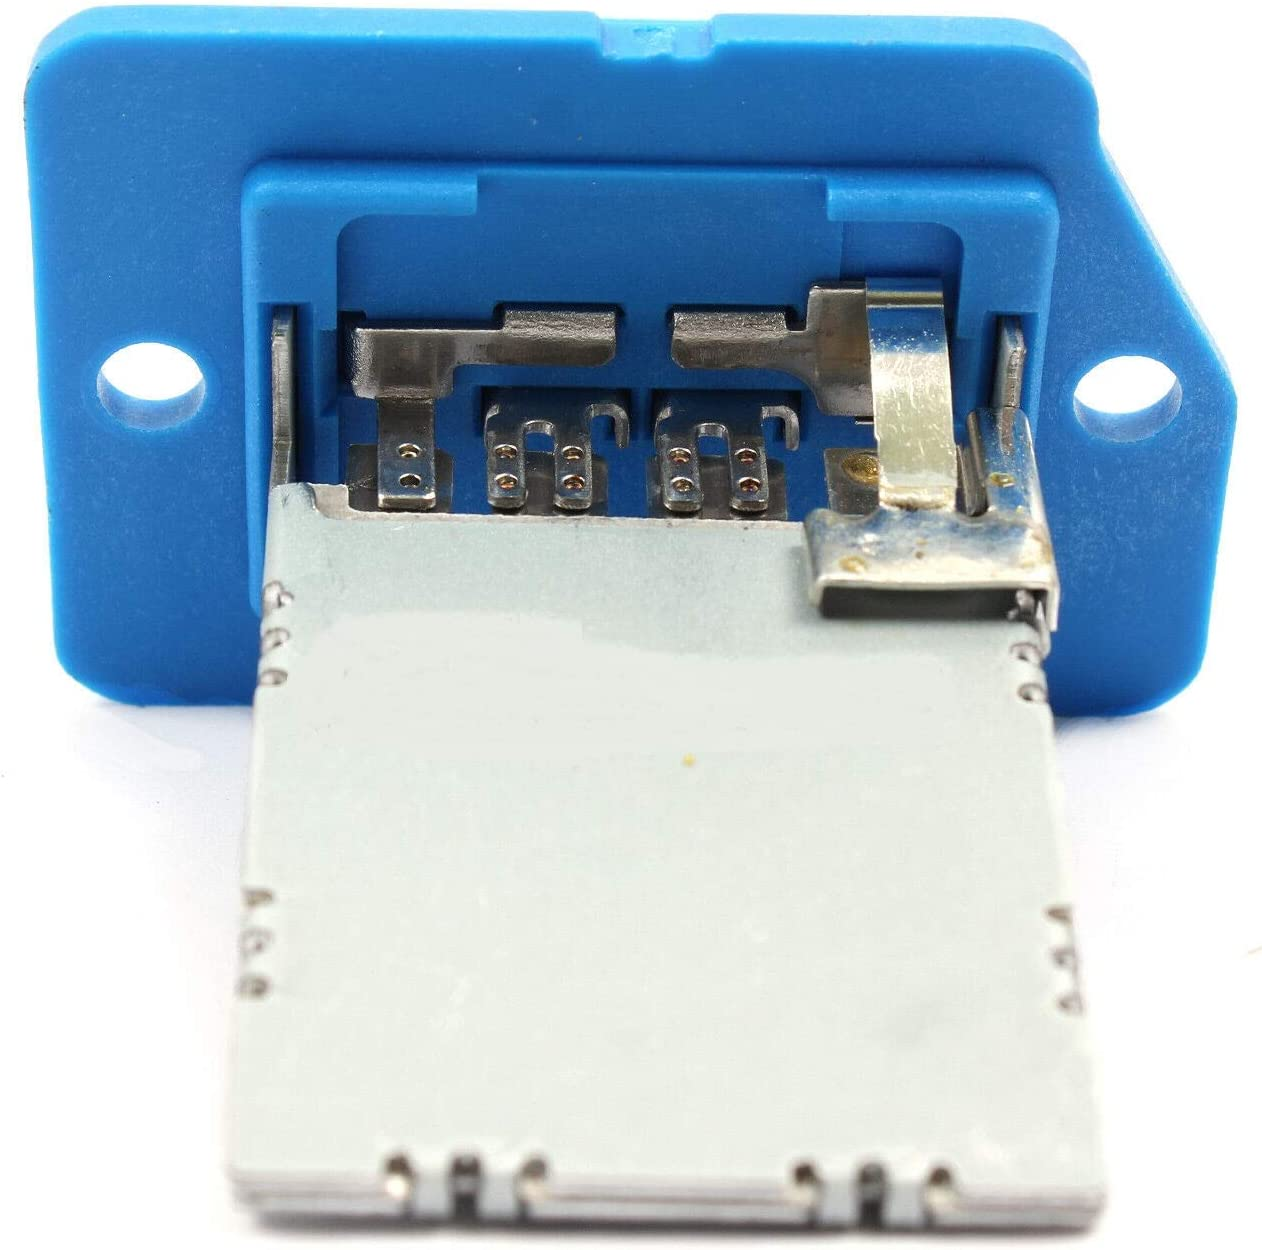 3//4 D DIM 3//8 Depth Double Sealed CAM Follower Bearing: CR-12 Buu 1 7//16 L DIM 9//16 Height DIM 158870